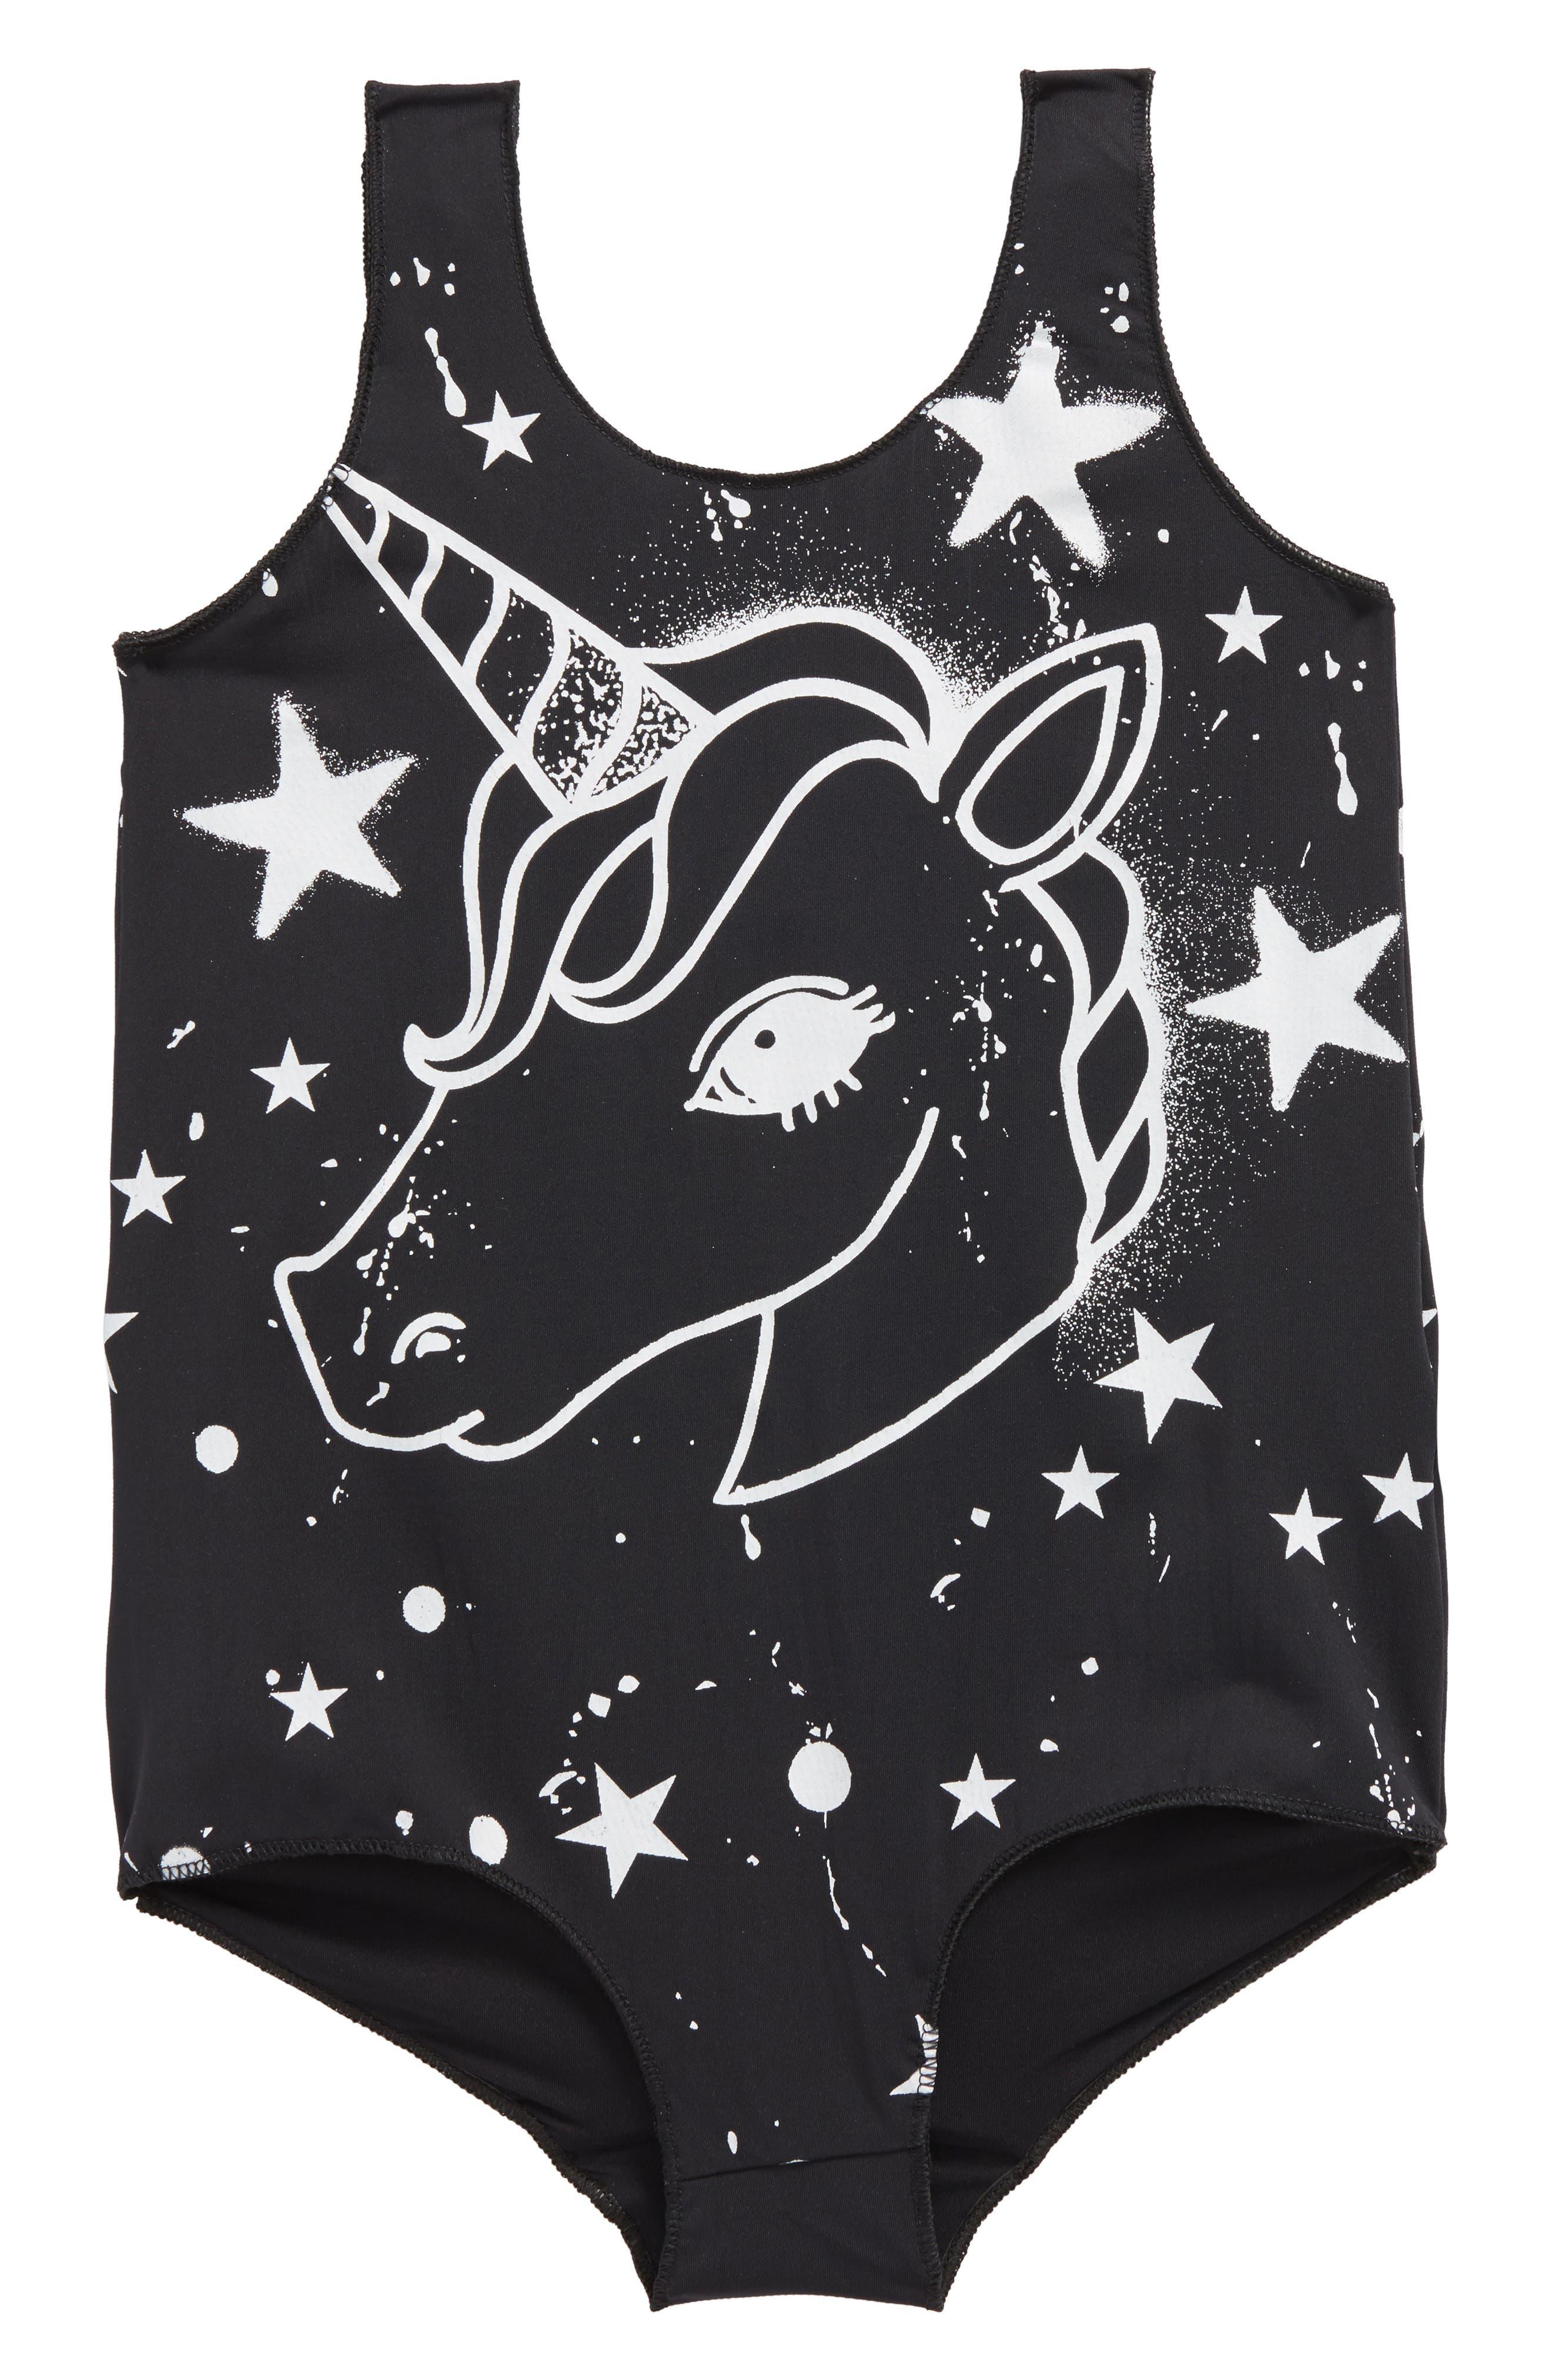 Unicorn One-Piece Swimsuit,                             Main thumbnail 1, color,                             Black Unicorn